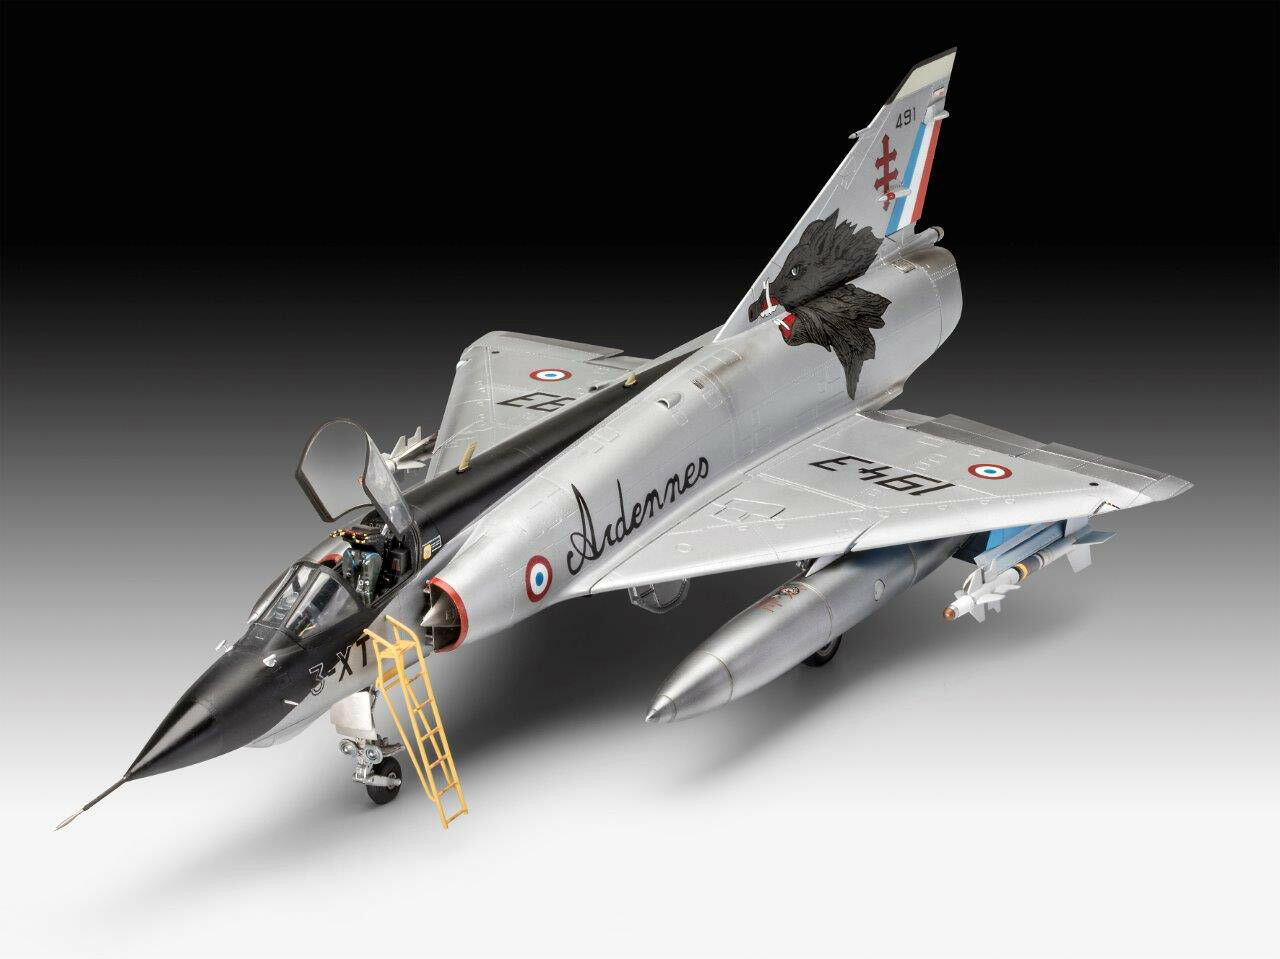 Revell 03919 Mirage lll E RD O Dassault Aviation Plastic Kit 1 32 Scale T48 Post